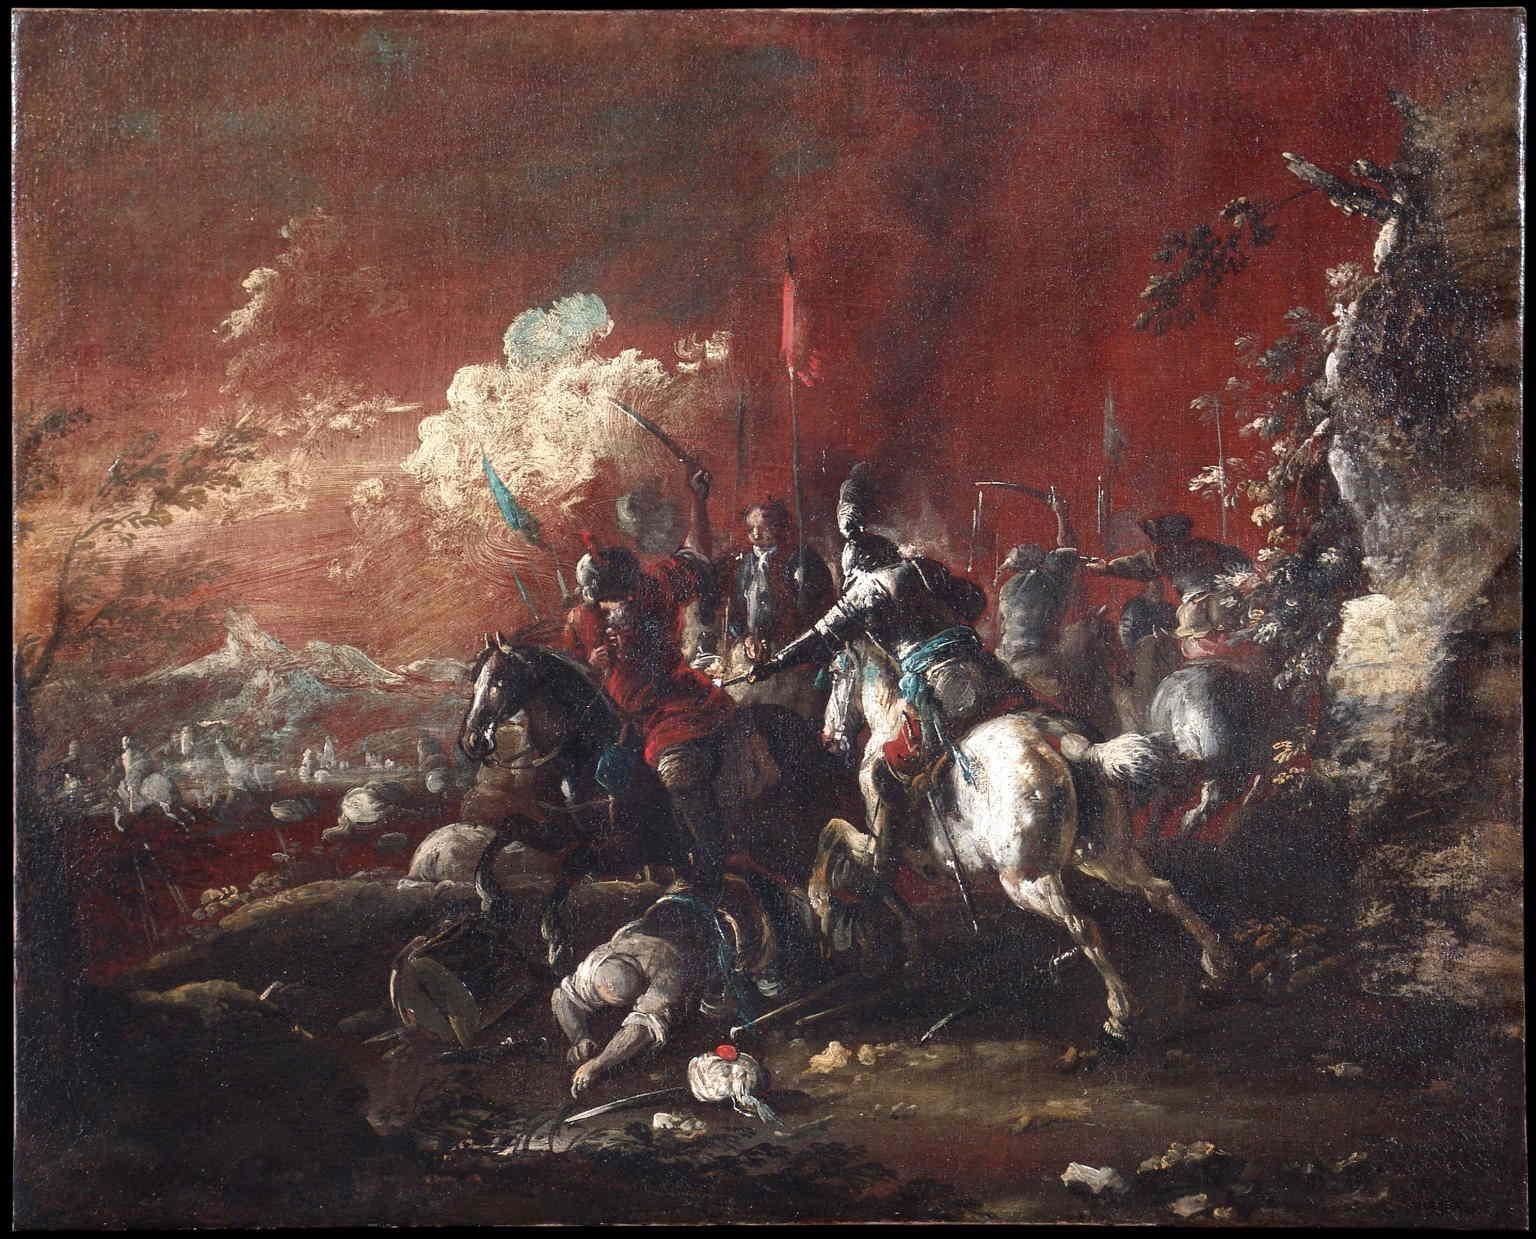 Matteo Stom, Battle between turkish and christian knights, XVII, oil on canvas